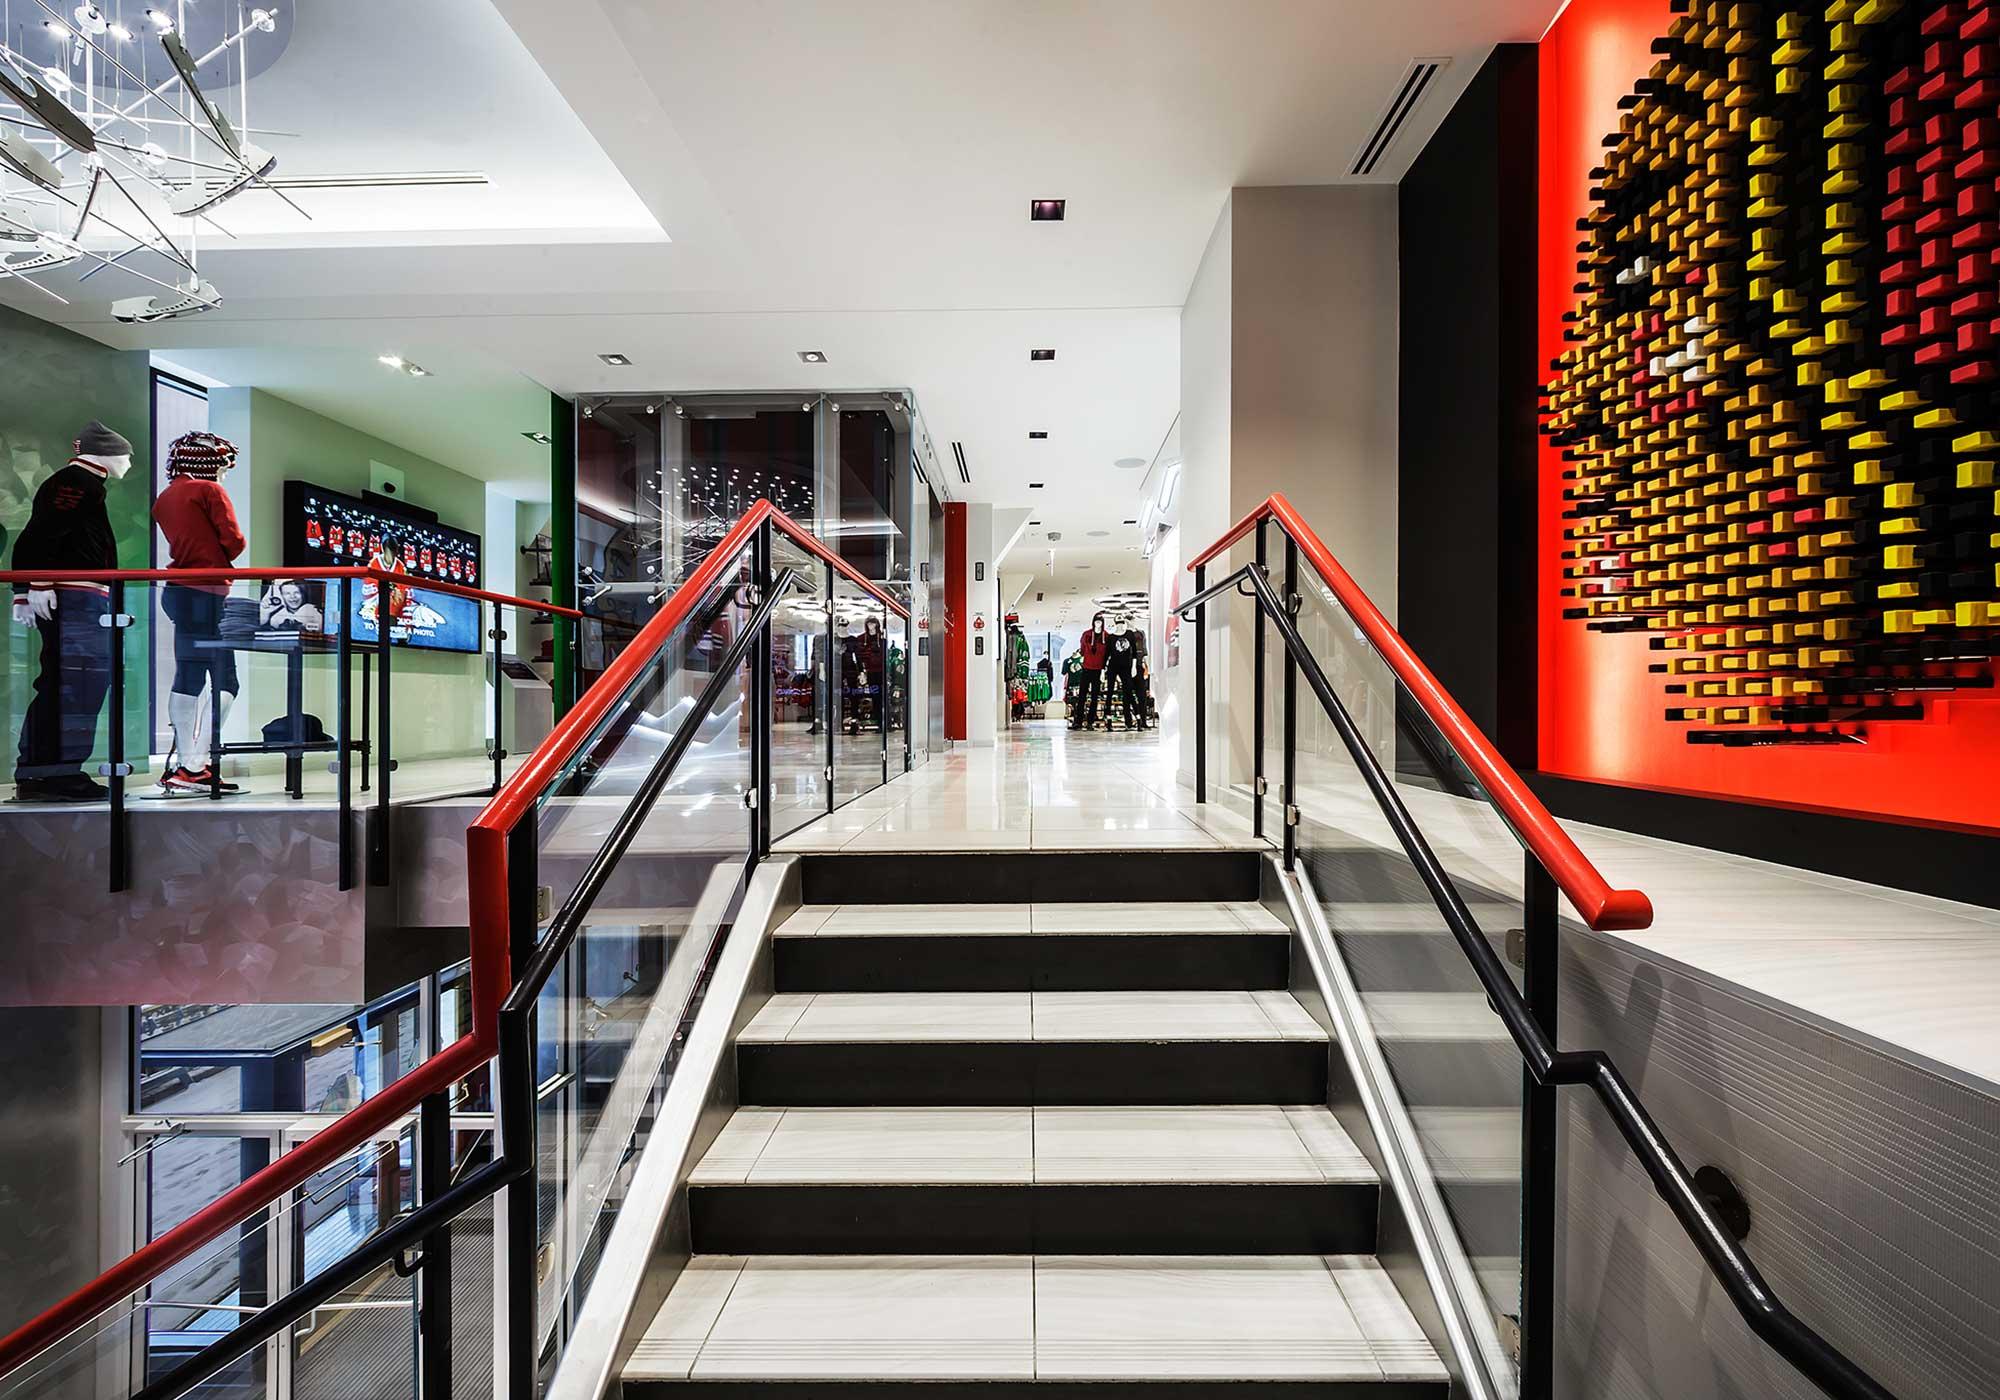 Stairway entering into Blackhawks store